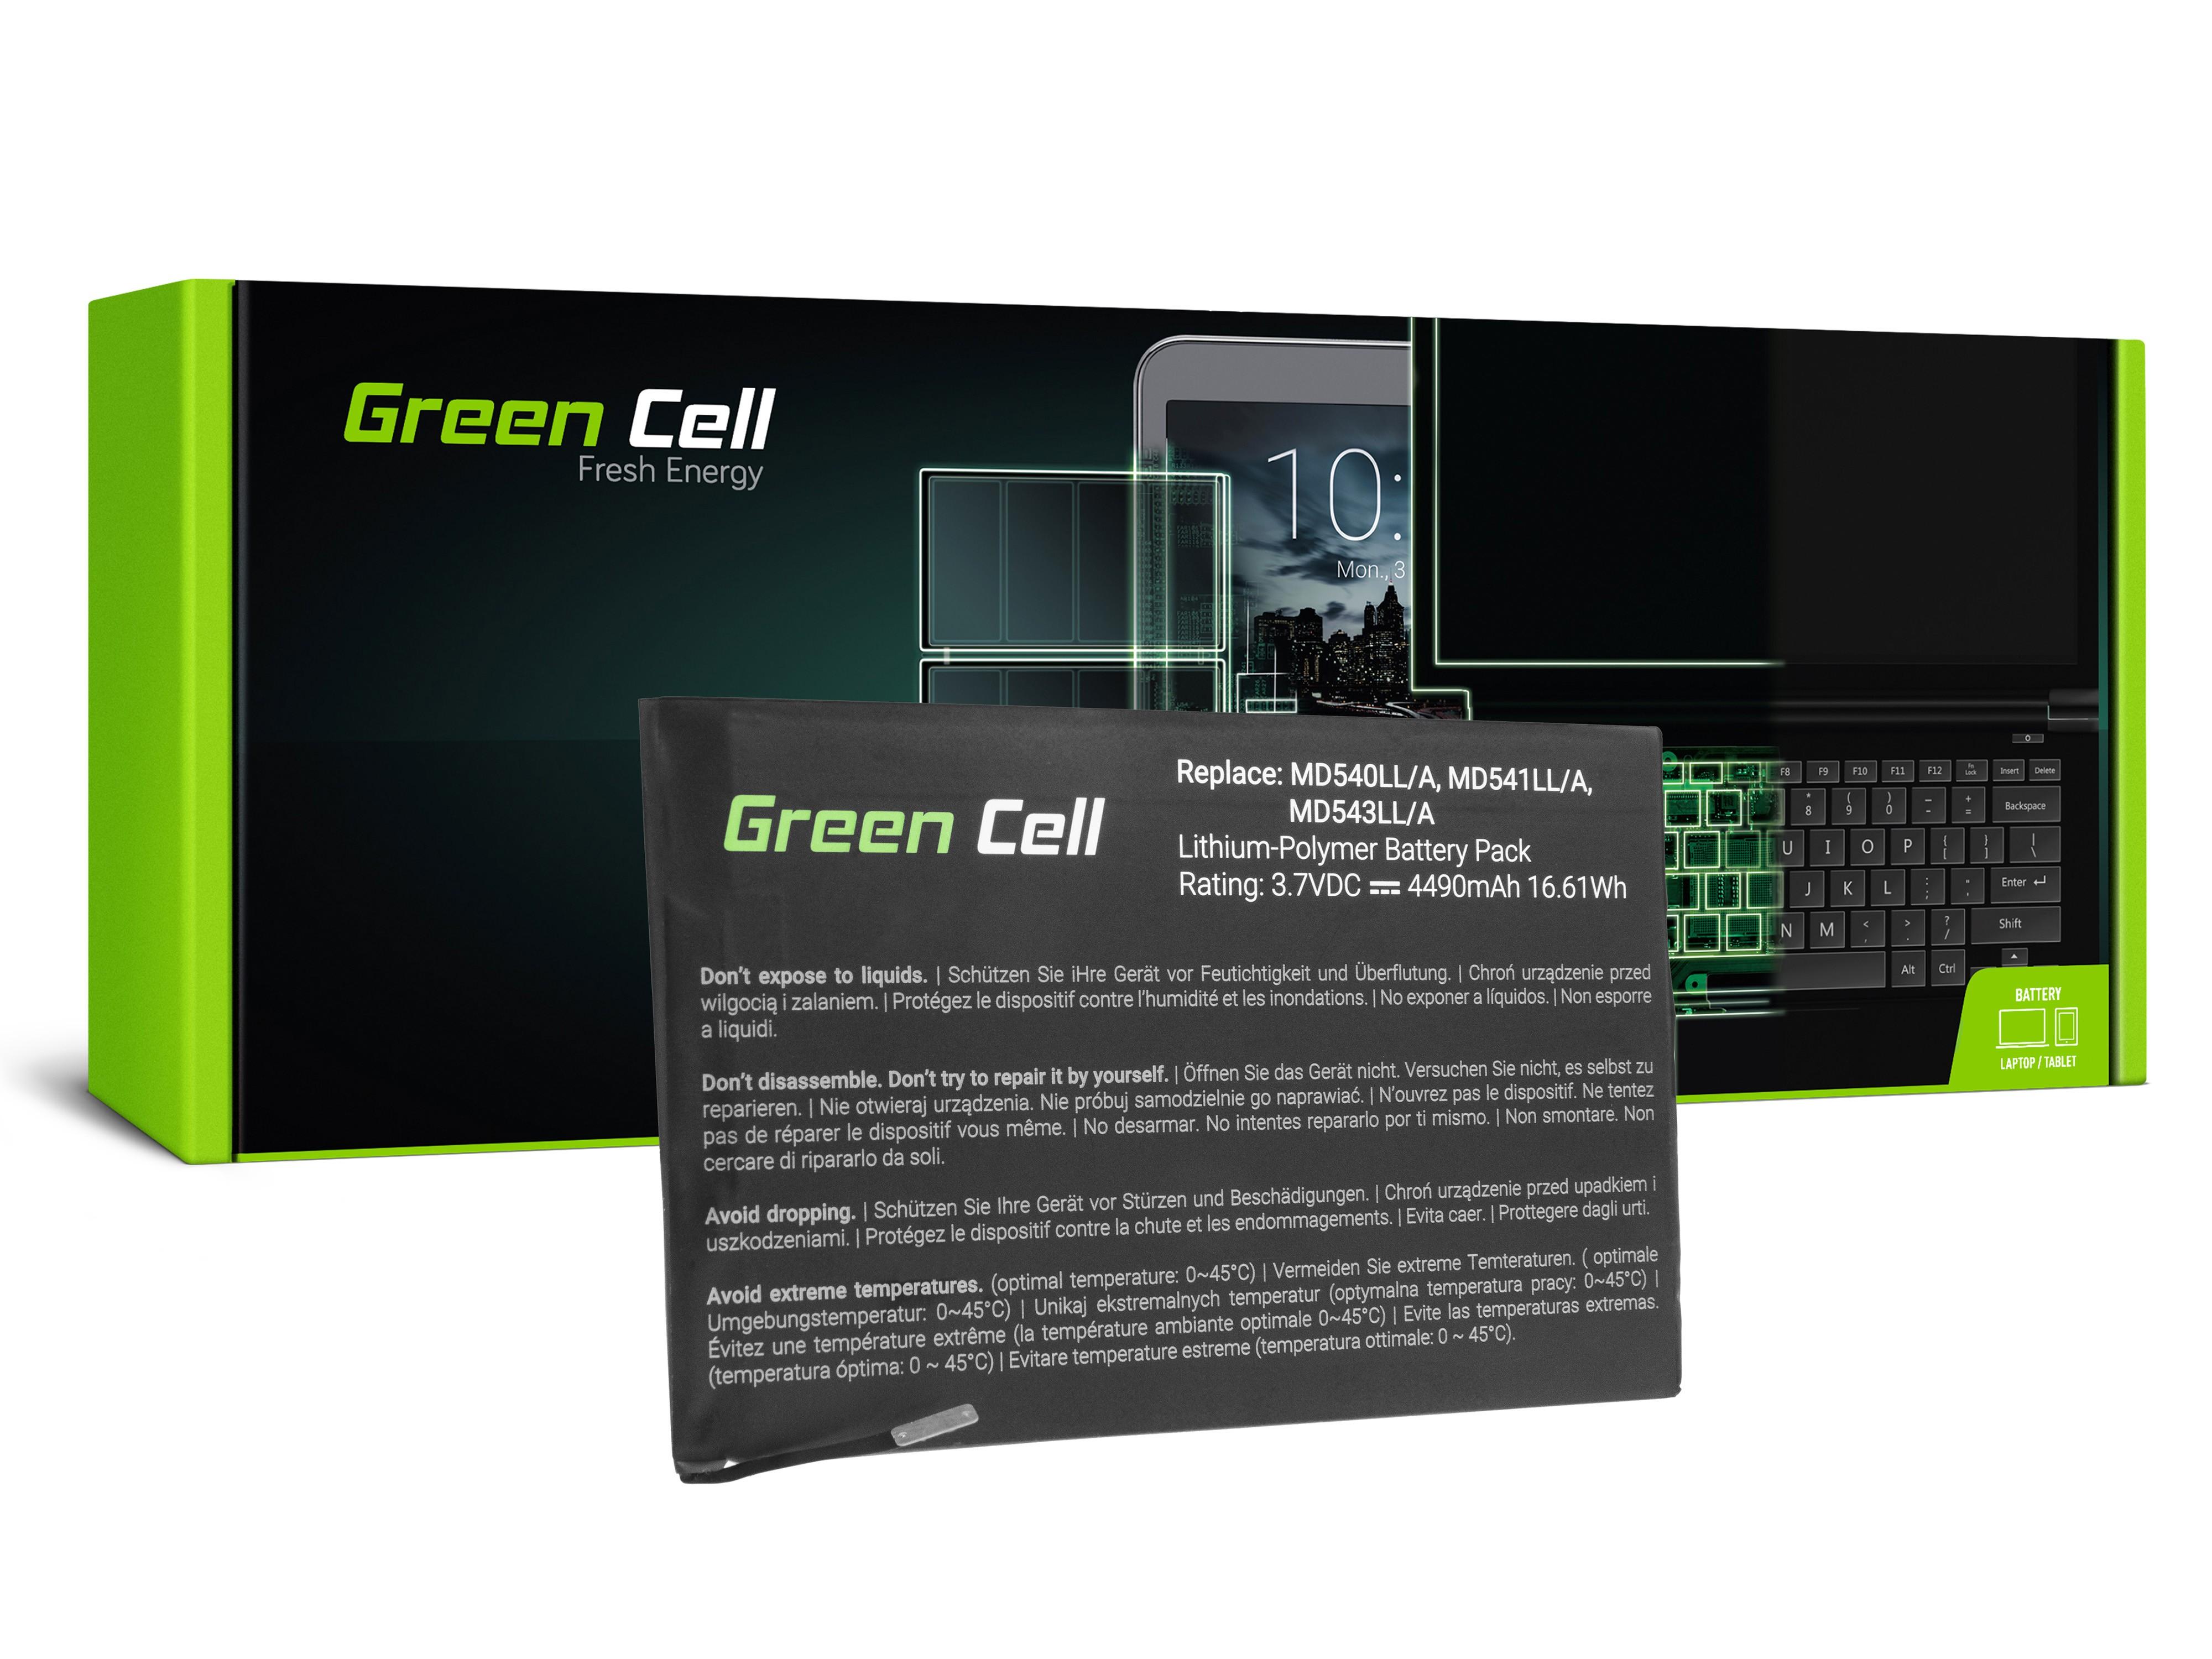 Batteri av Green Cellsurfplatta A1445 Apple iPad Mini A1432 A1454 A1455